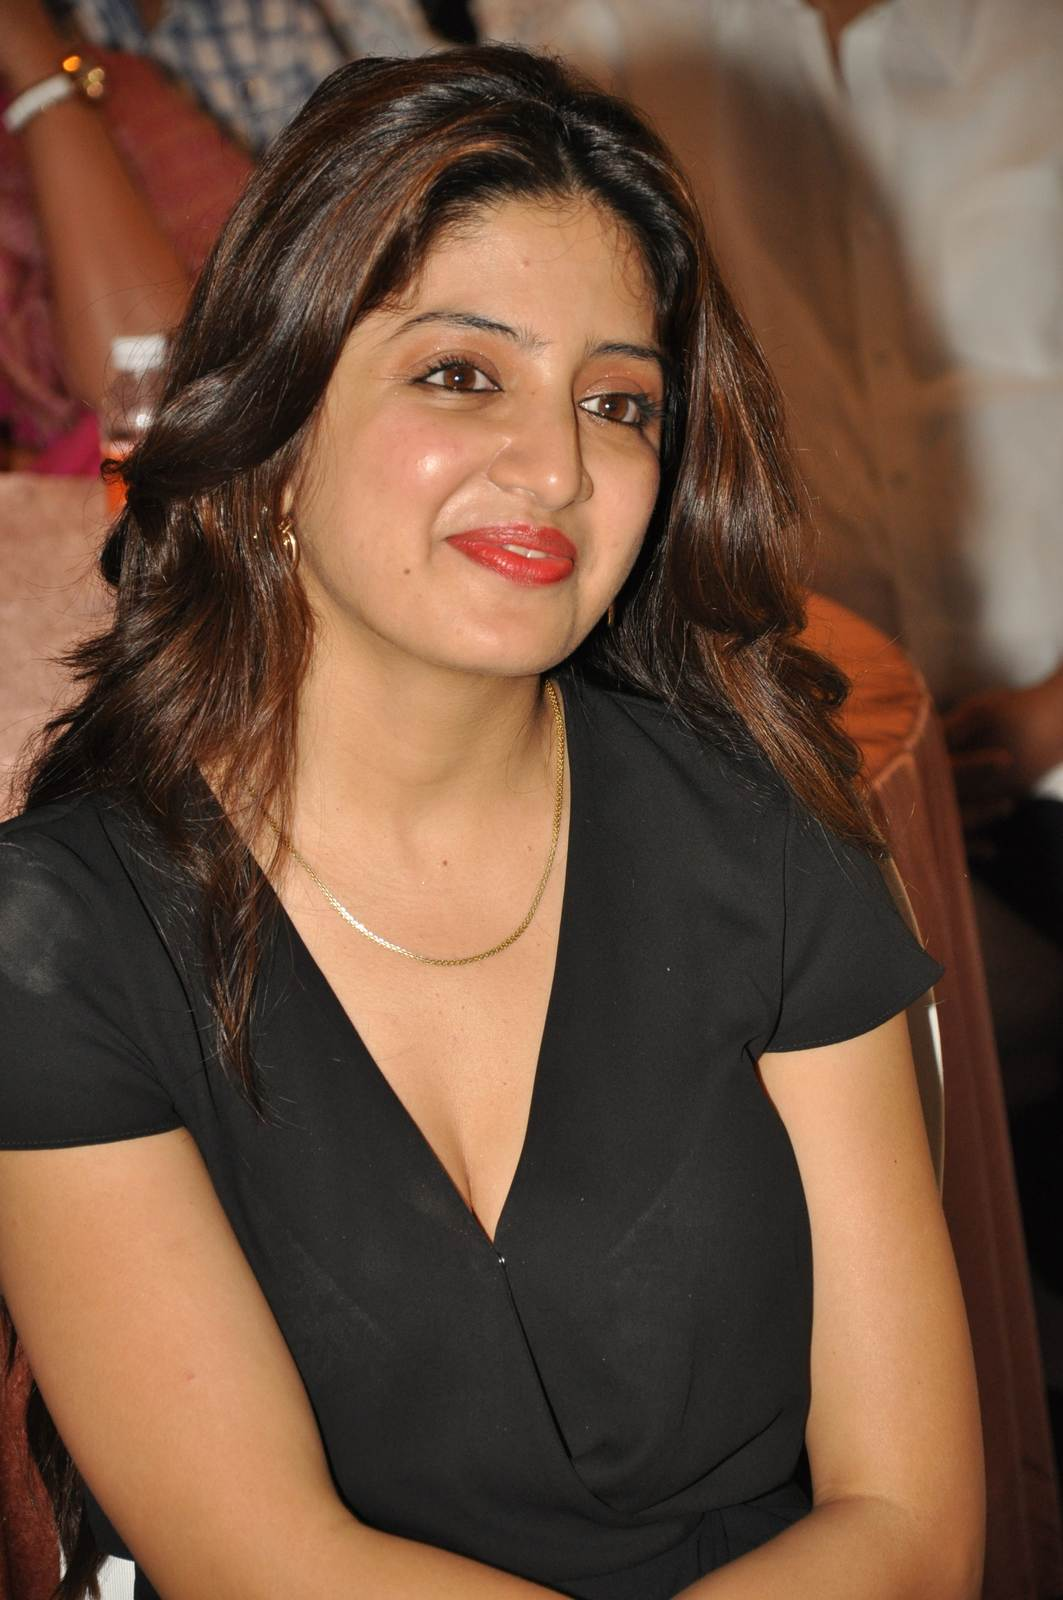 Poonam Kaur Stills in Black Dress, Poonam Kaur hot Pics in black Dress from 365 Days Movie Audio Launch